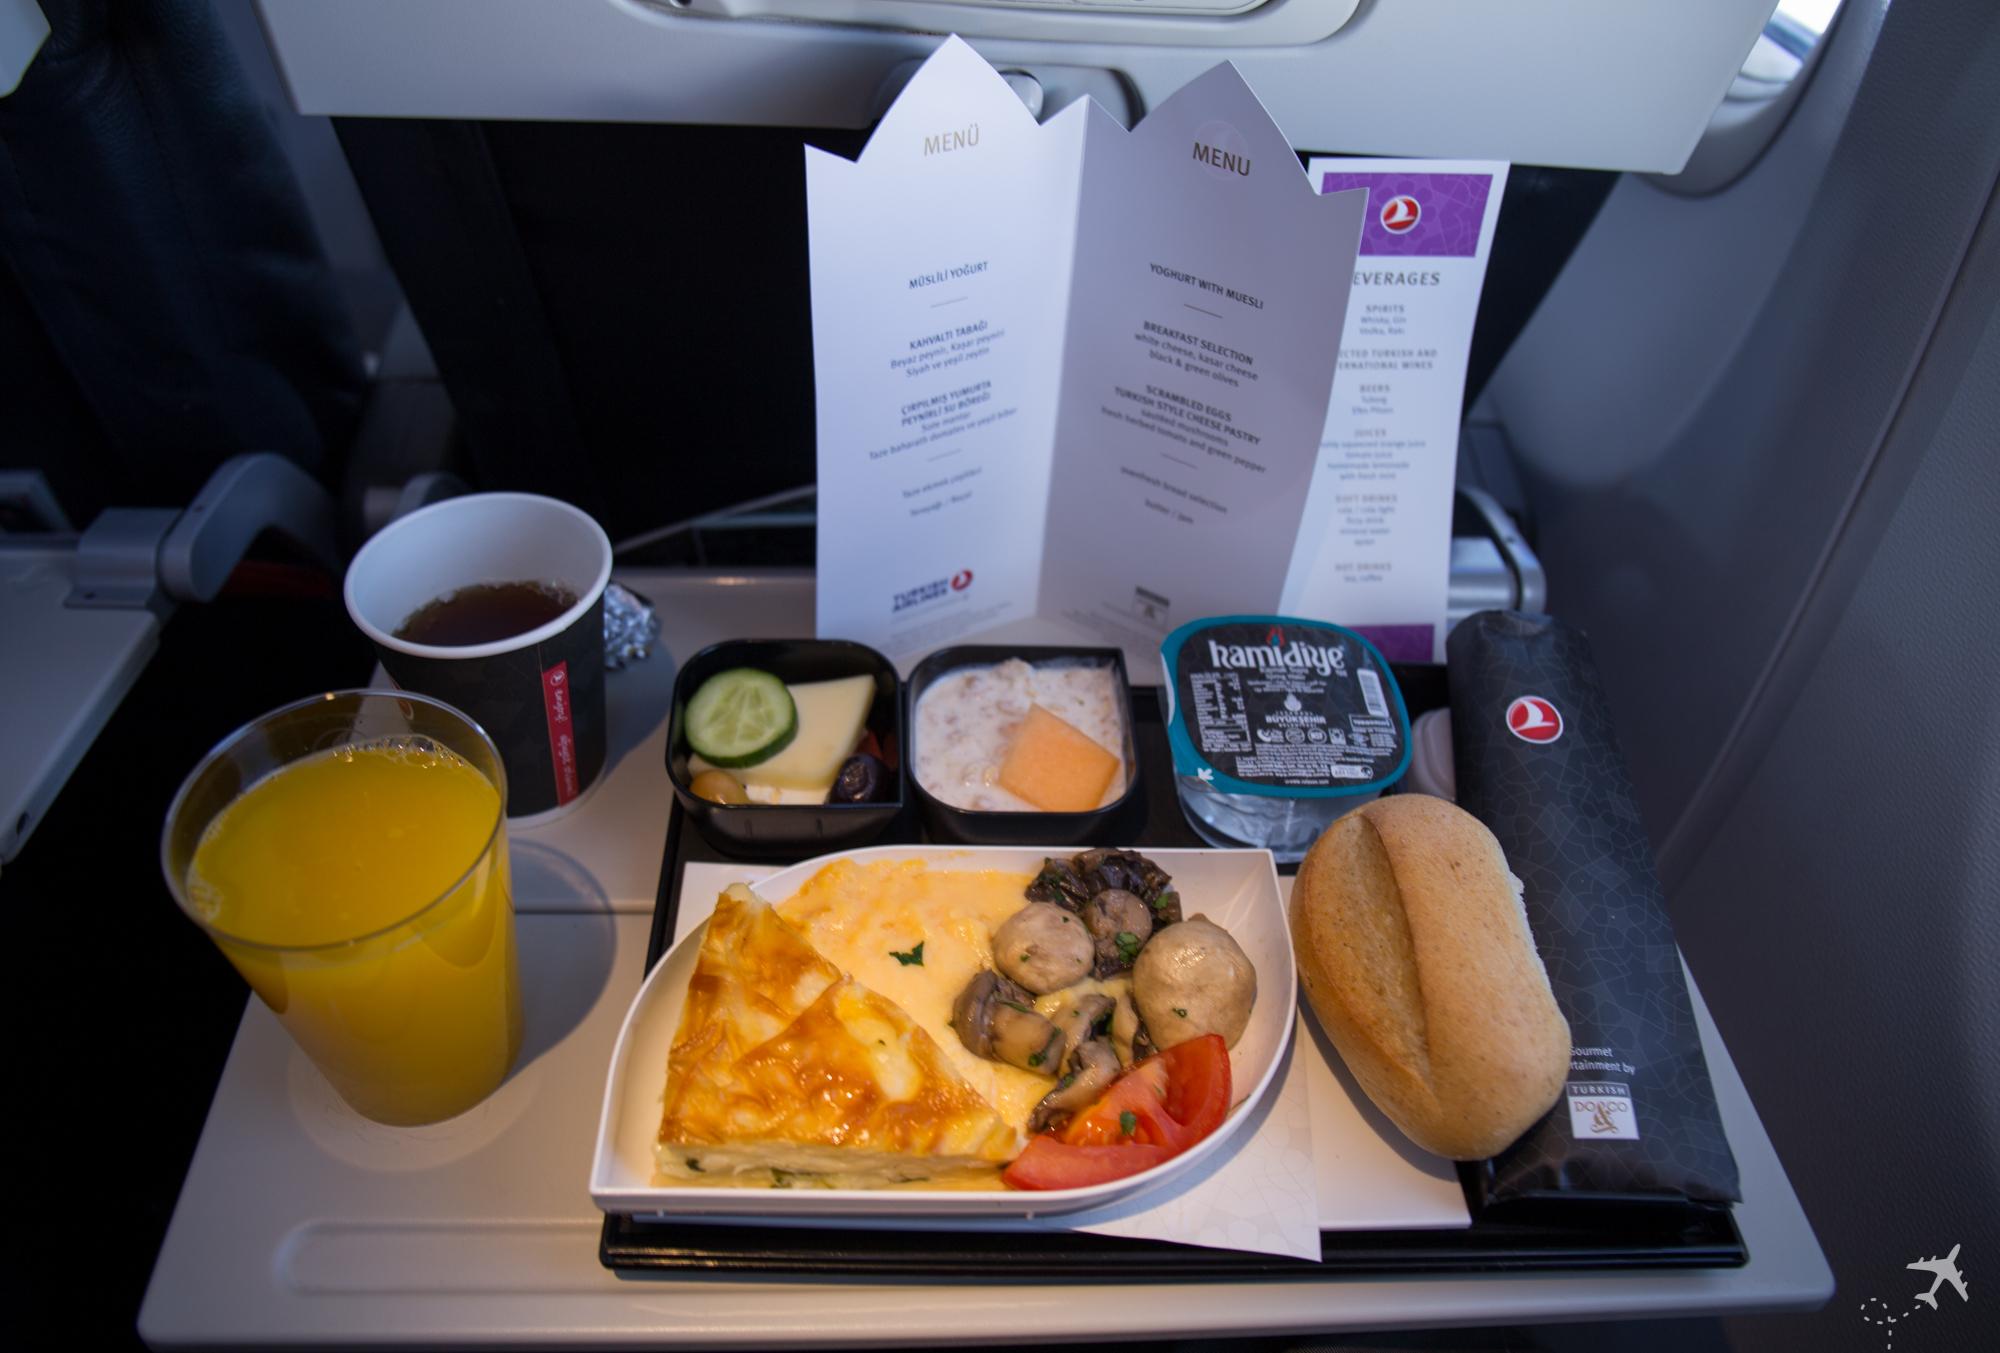 Turkish Airlines Economy Class Essen Mittelstrecke Rückflug